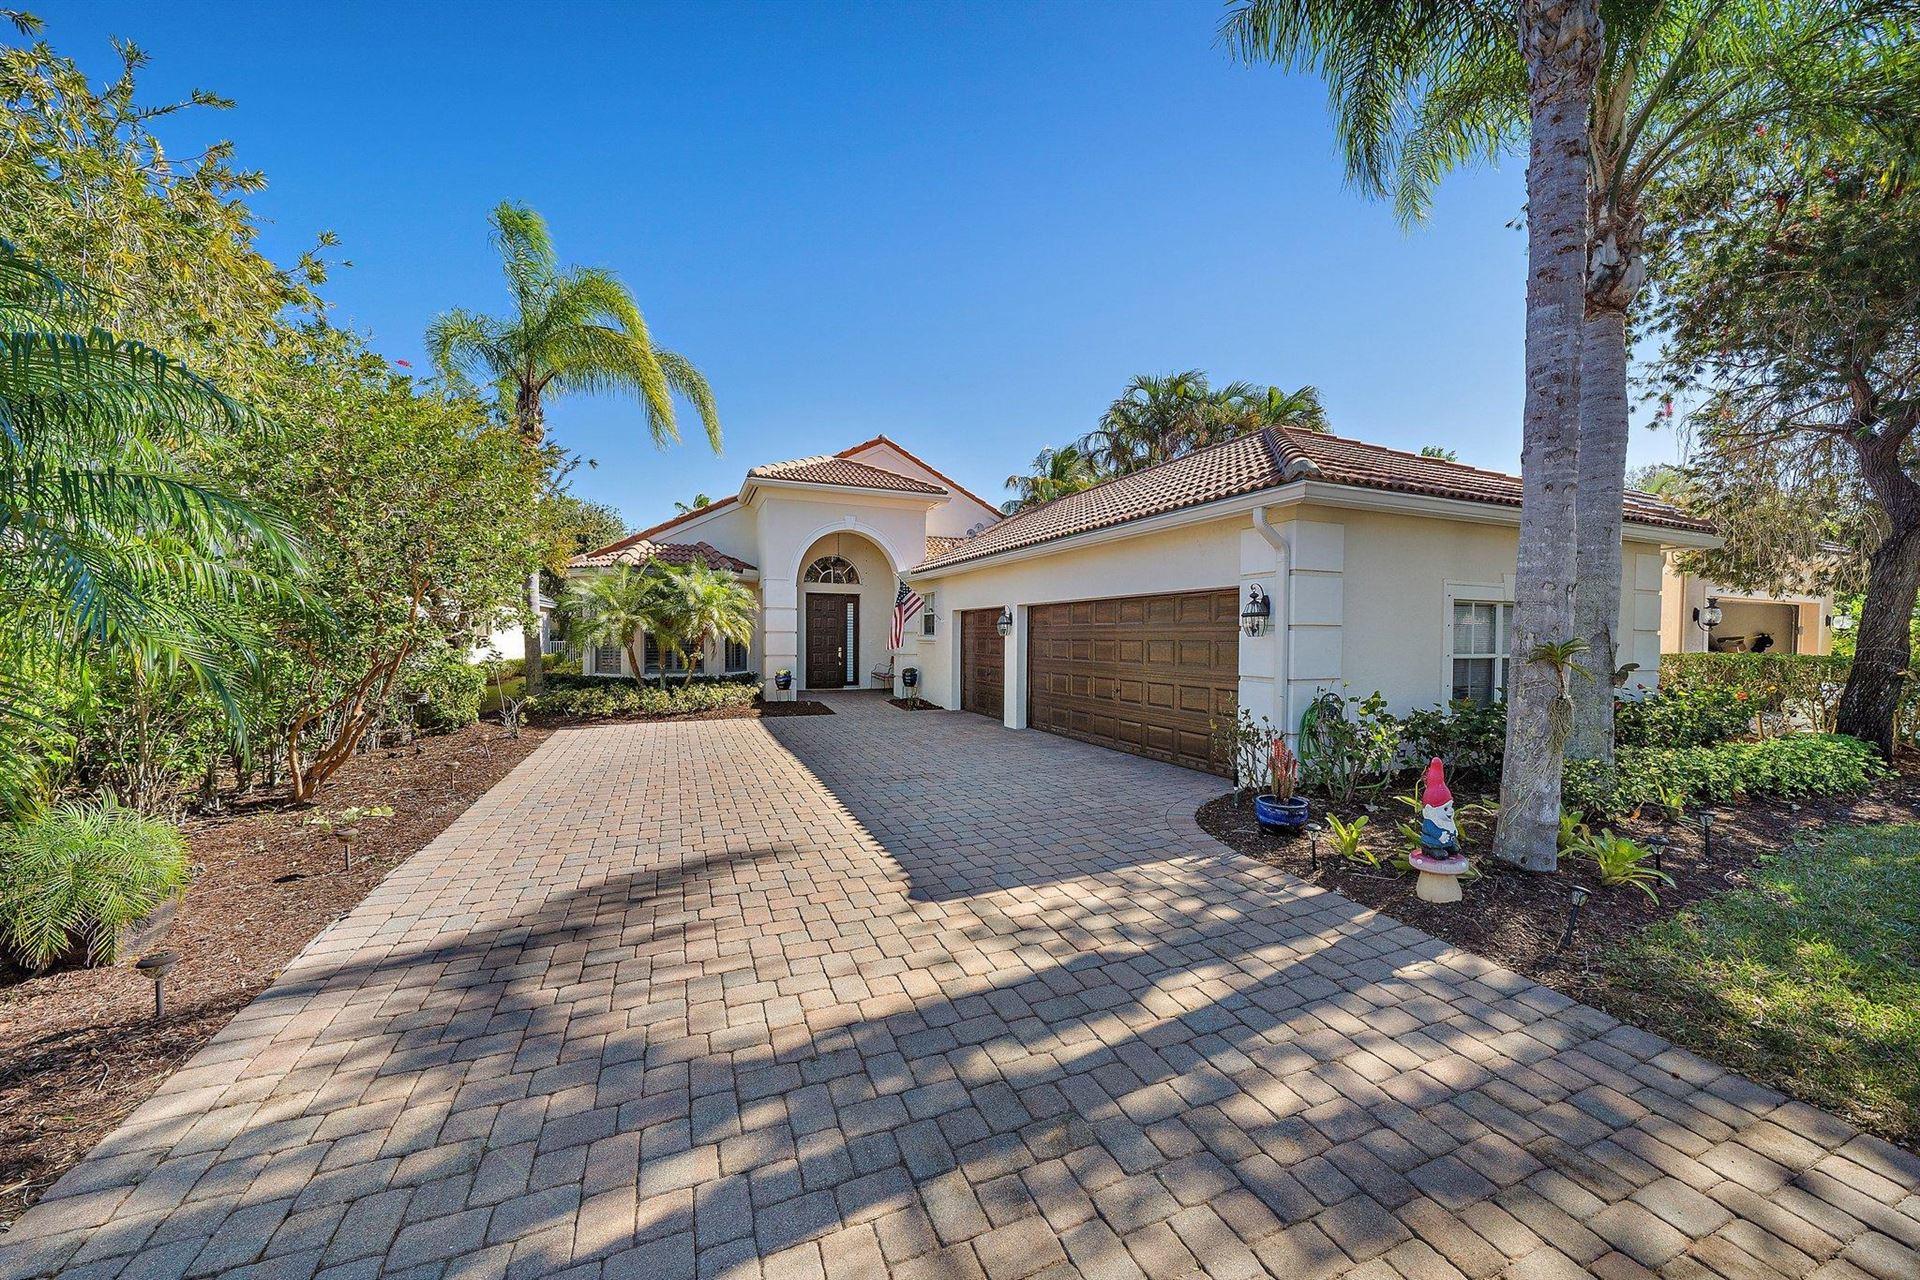 Photo of 8161 Cypress Point Road, West Palm Beach, FL 33412 (MLS # RX-10690304)